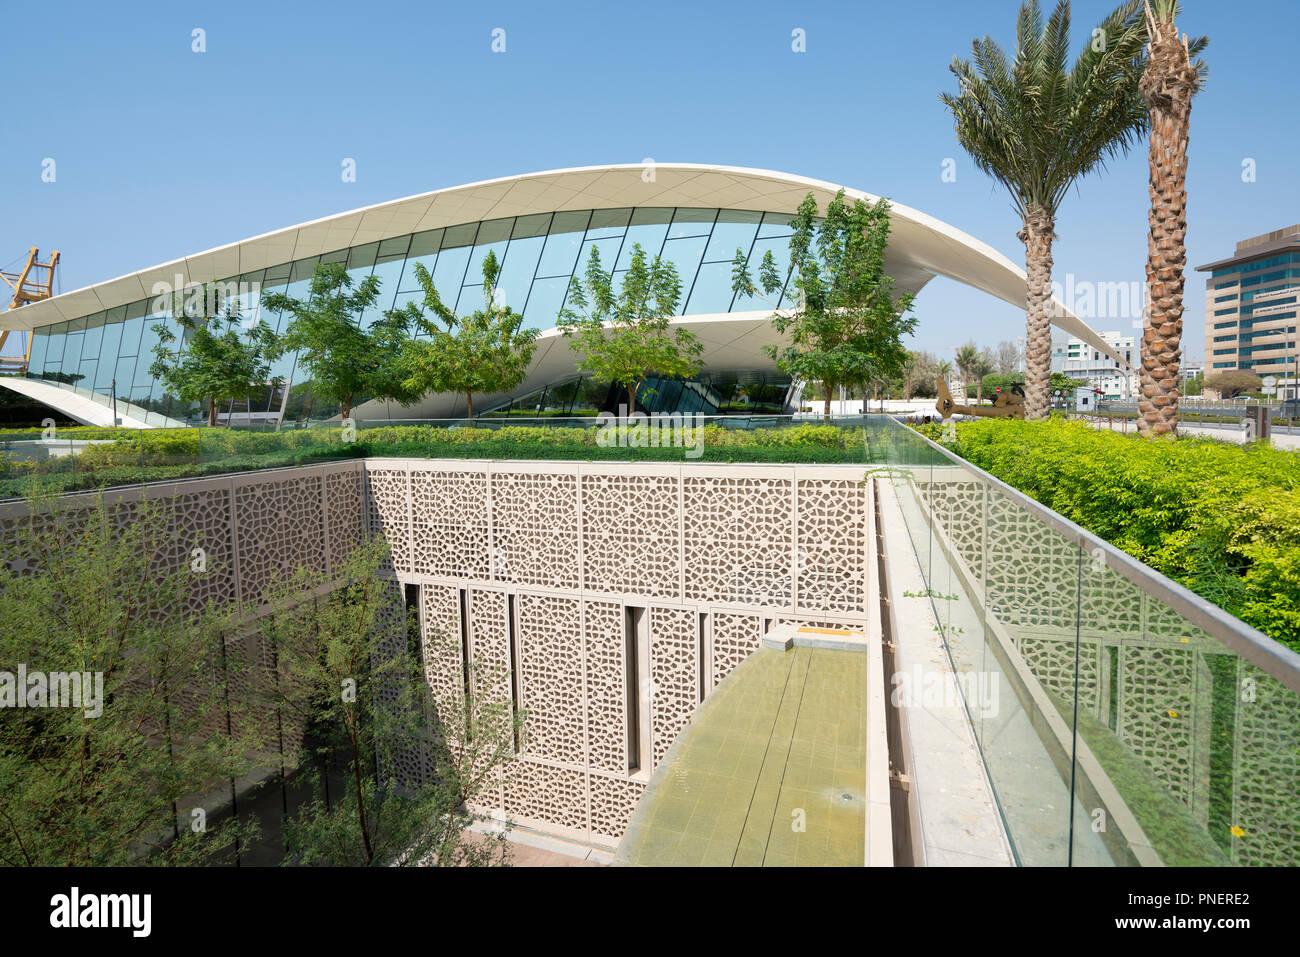 Modern Etihad Museum , a history museum of the UAE, in Dubai, United Arab Emirates. - Stock Image